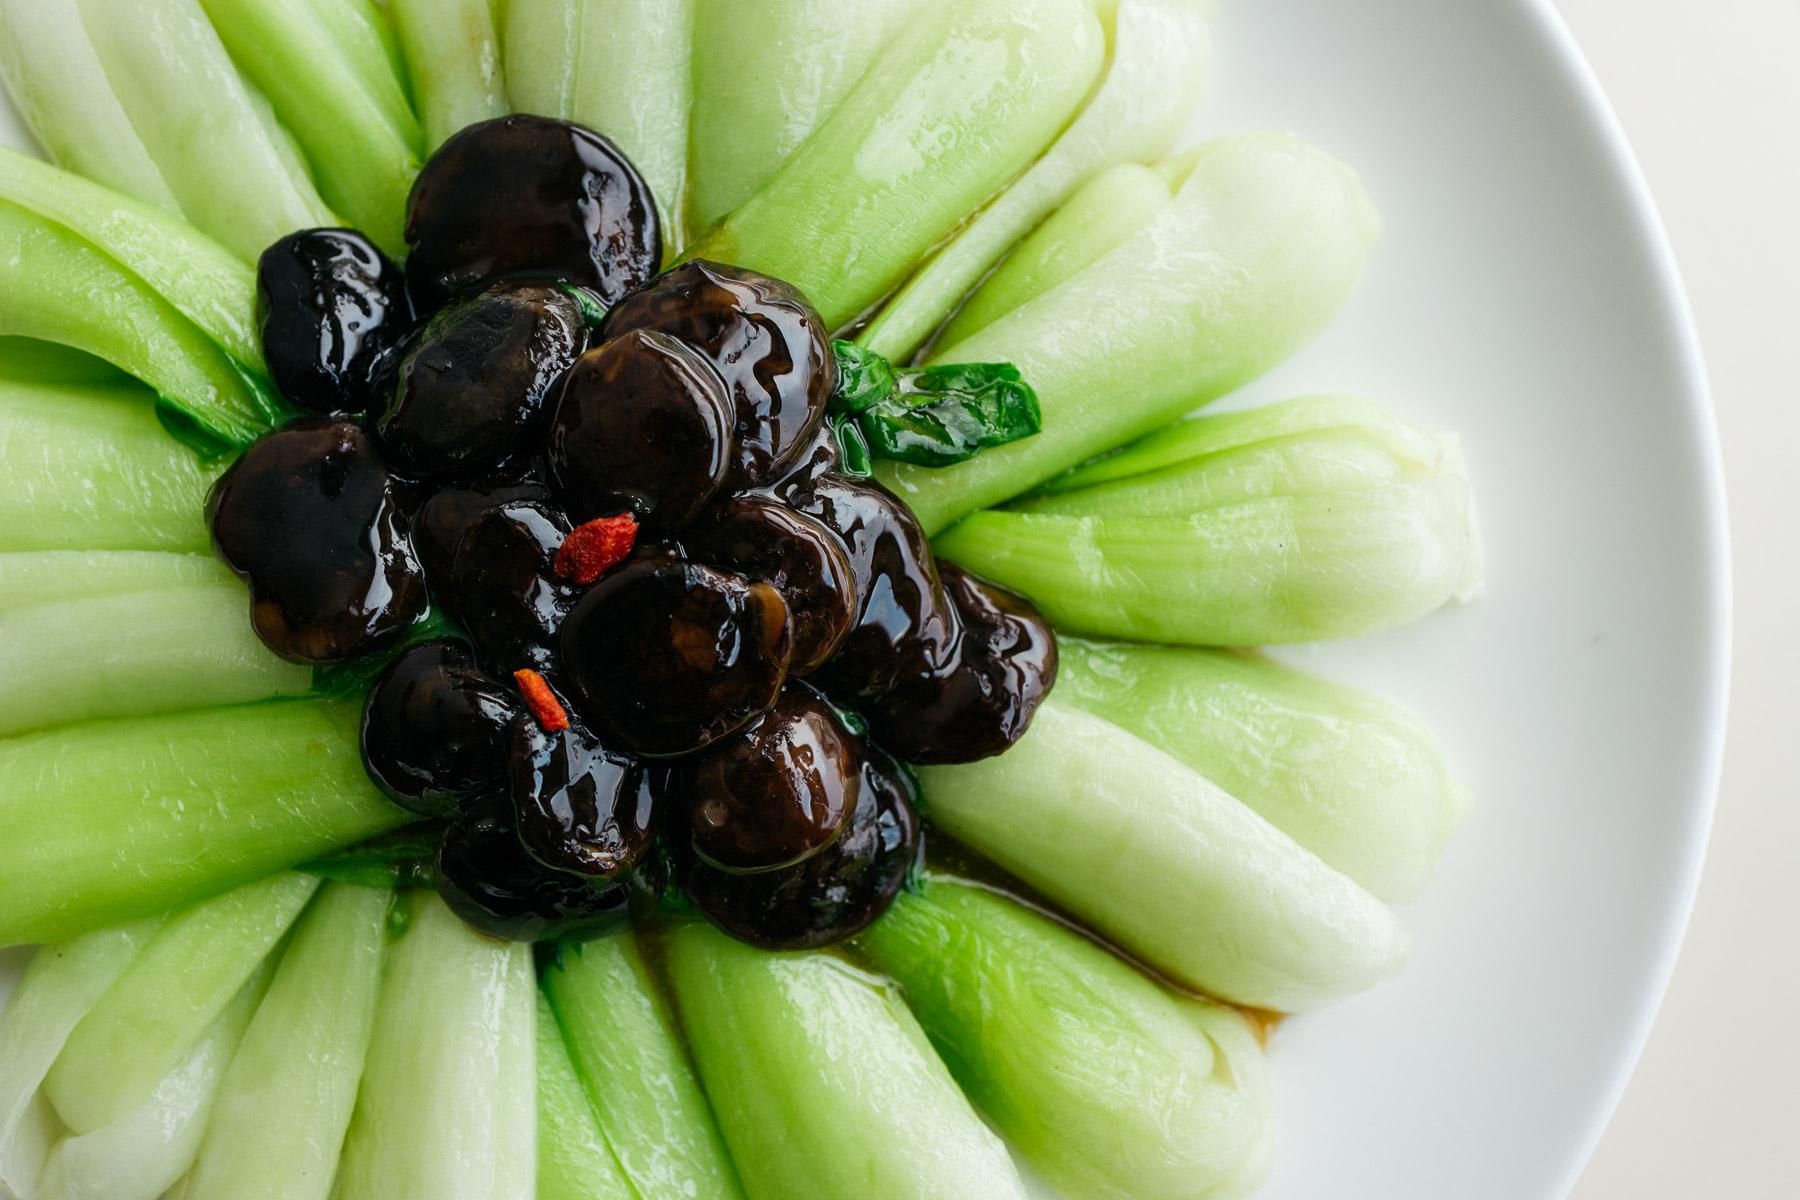 Kapusta pak choi z grzybami shitake (xiang gu pa xiang gu cai, 香菇扒香菇菜)